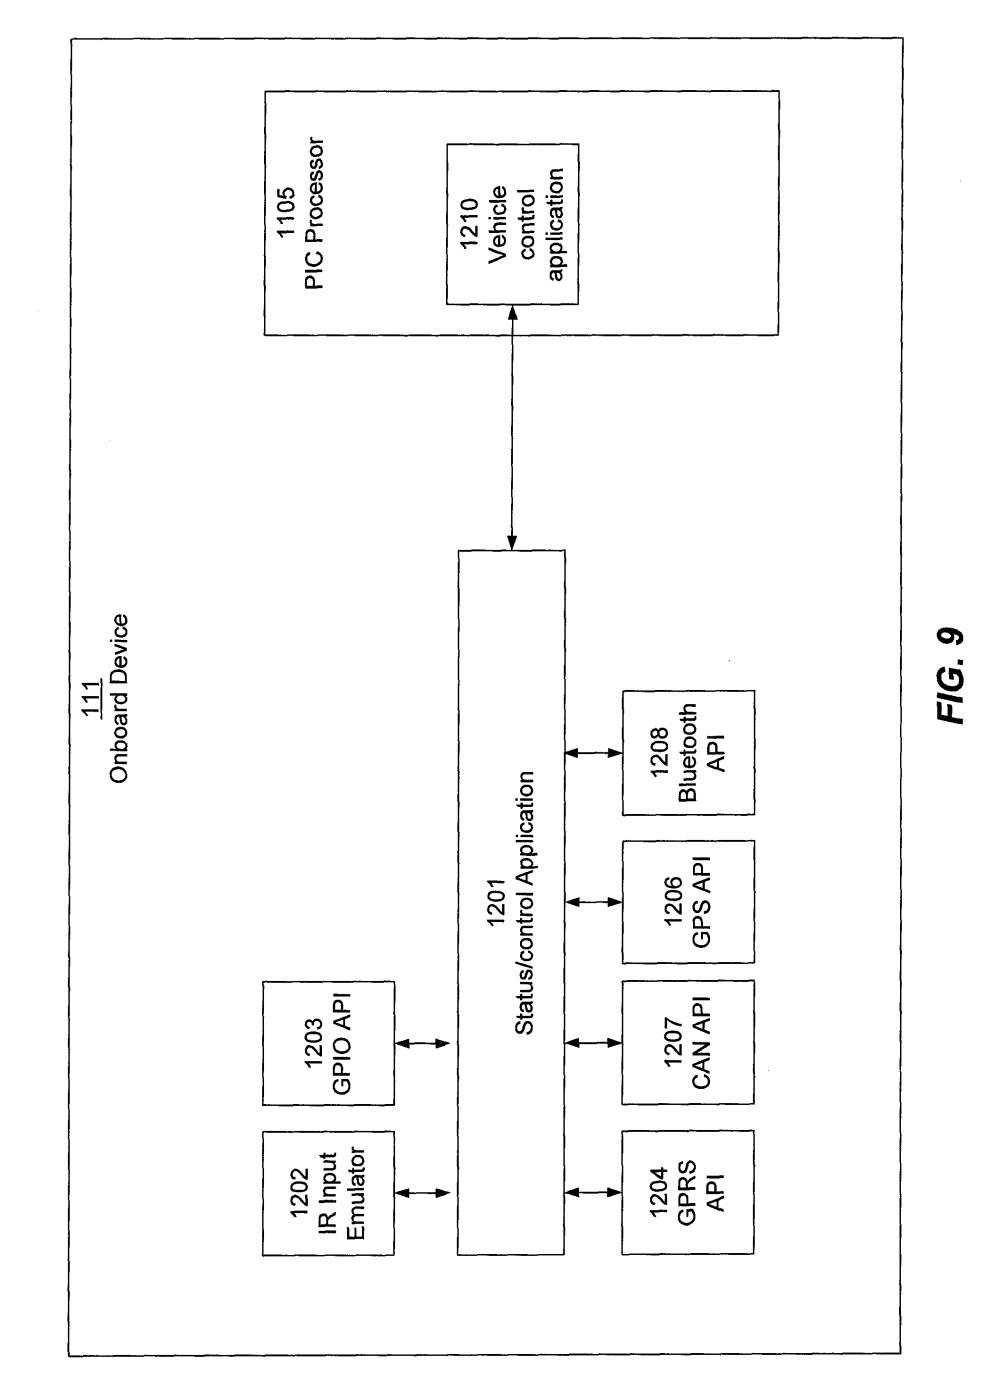 medium resolution of talon gps wiring diagram wiring diagram for you gps circuit board diagram spireon gps wiring diagram